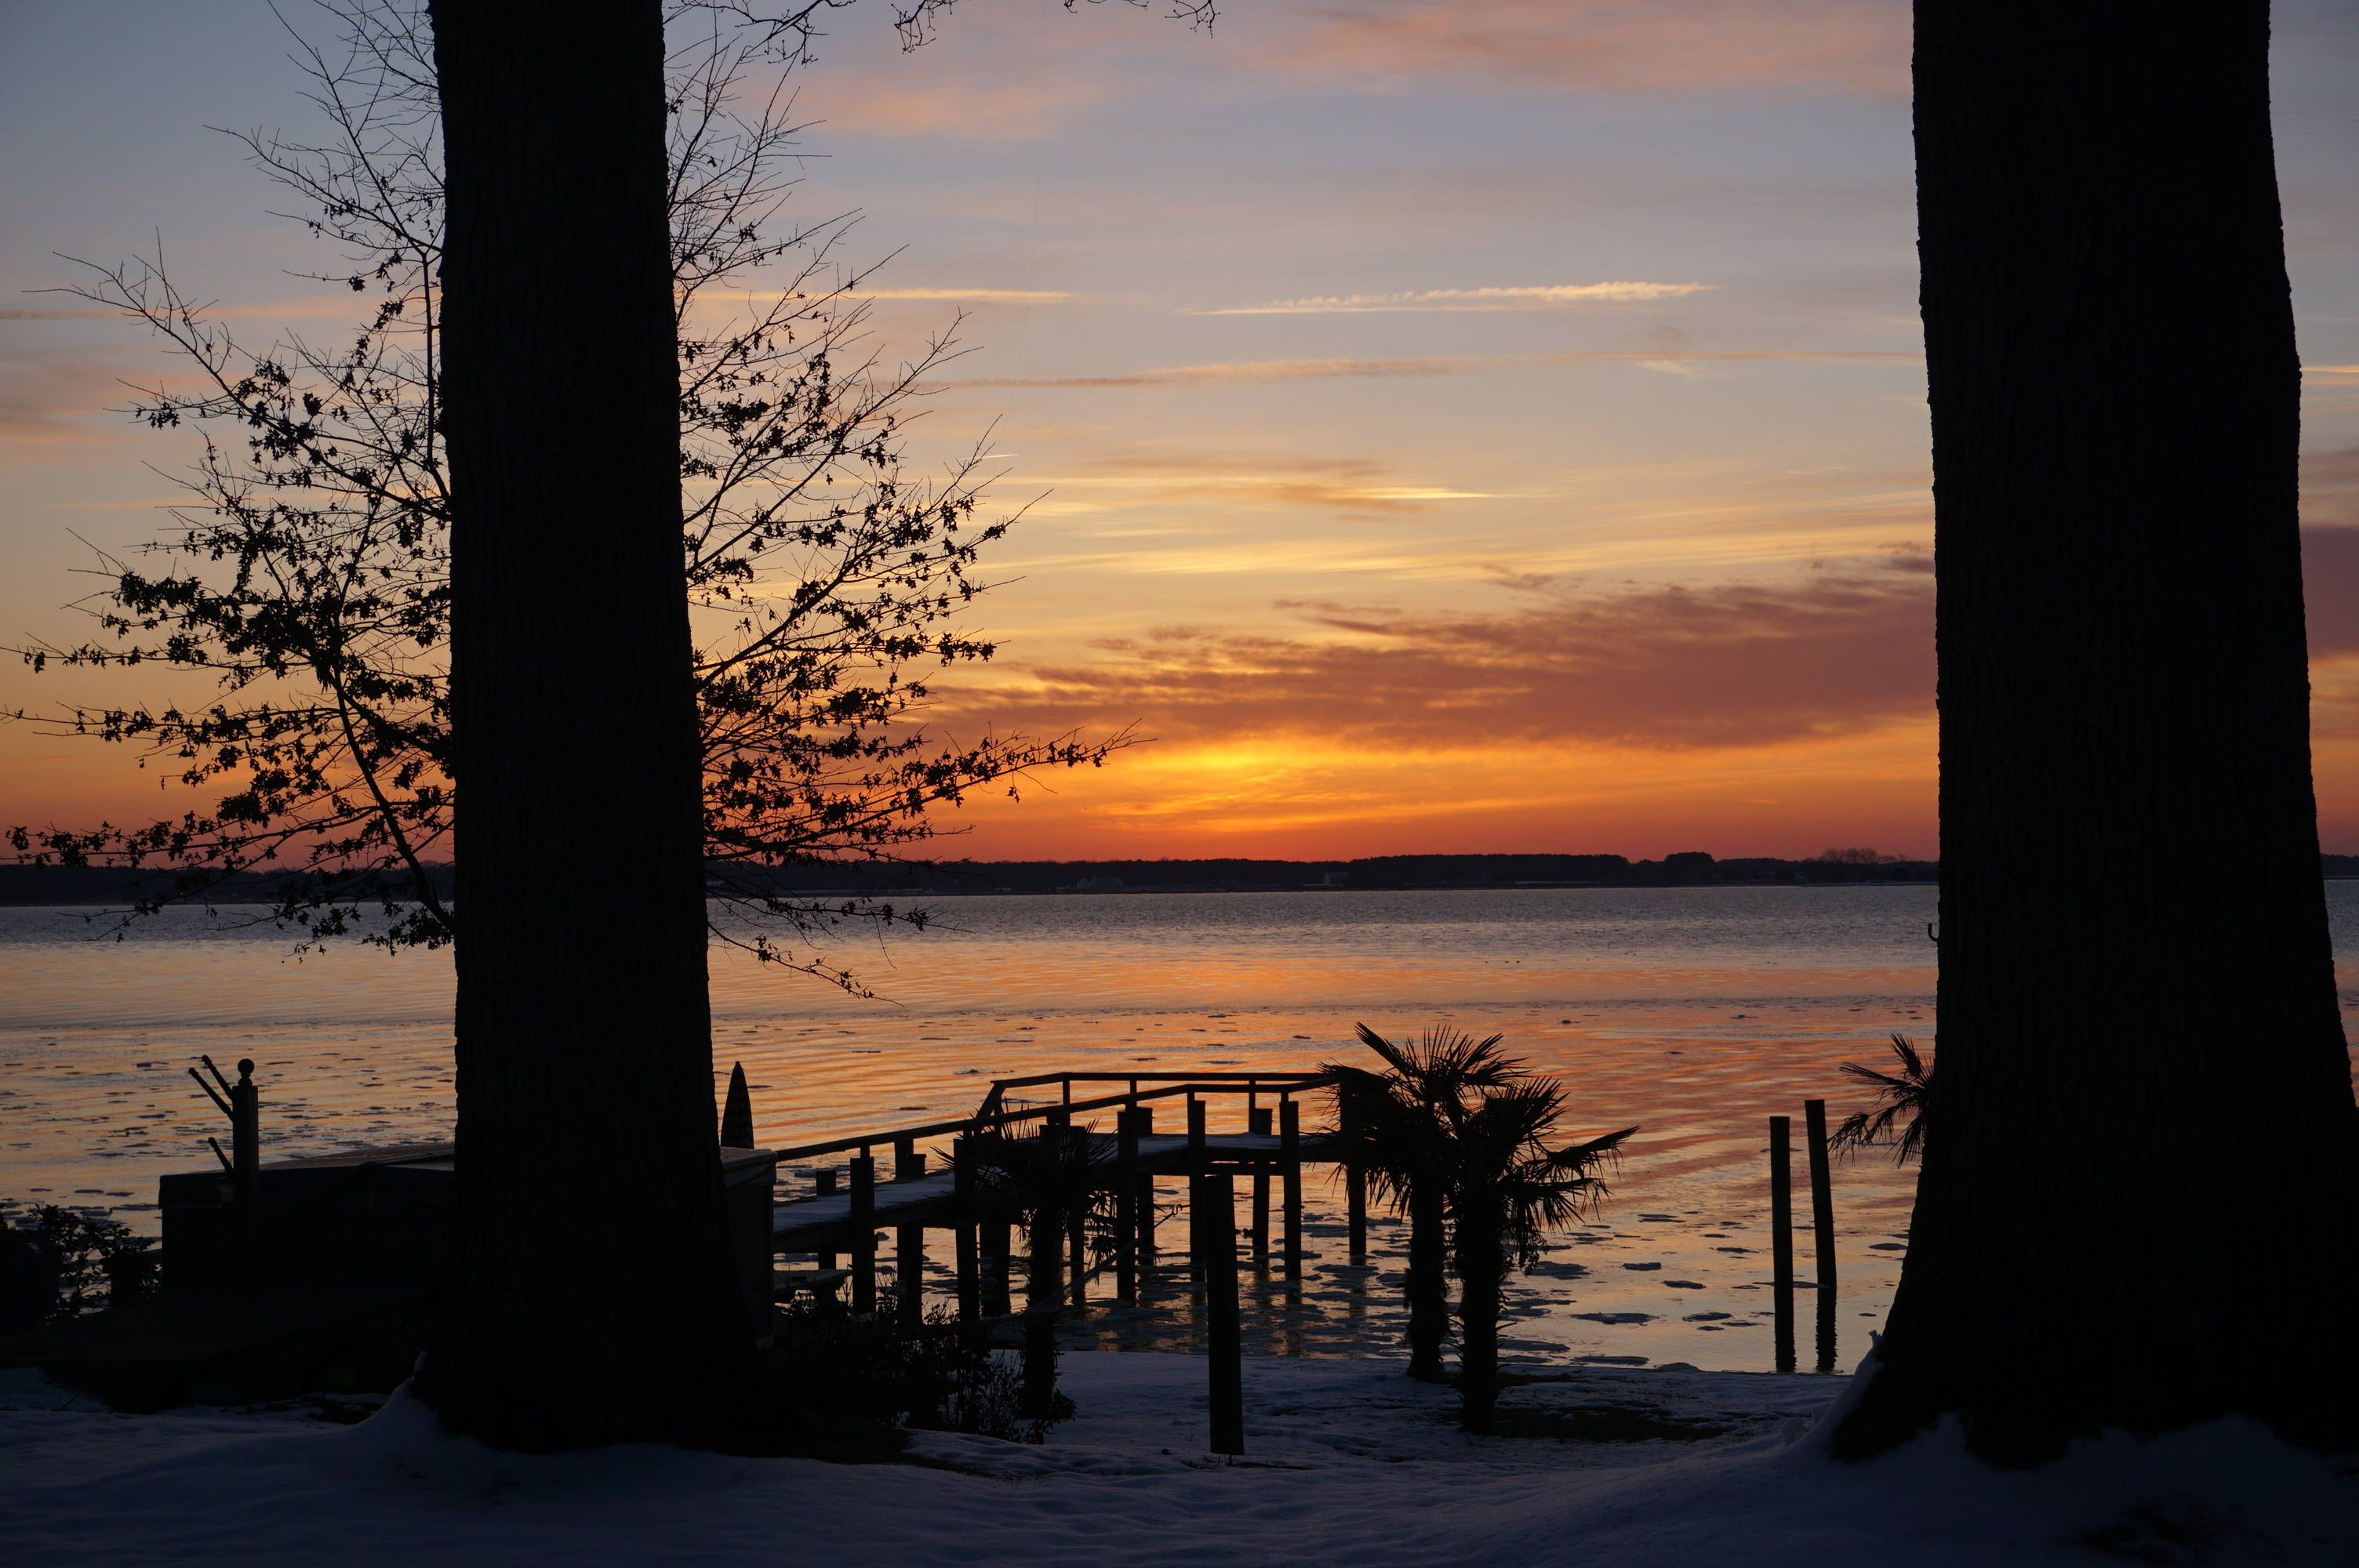 Cobb island md sunrise on cobb island md island